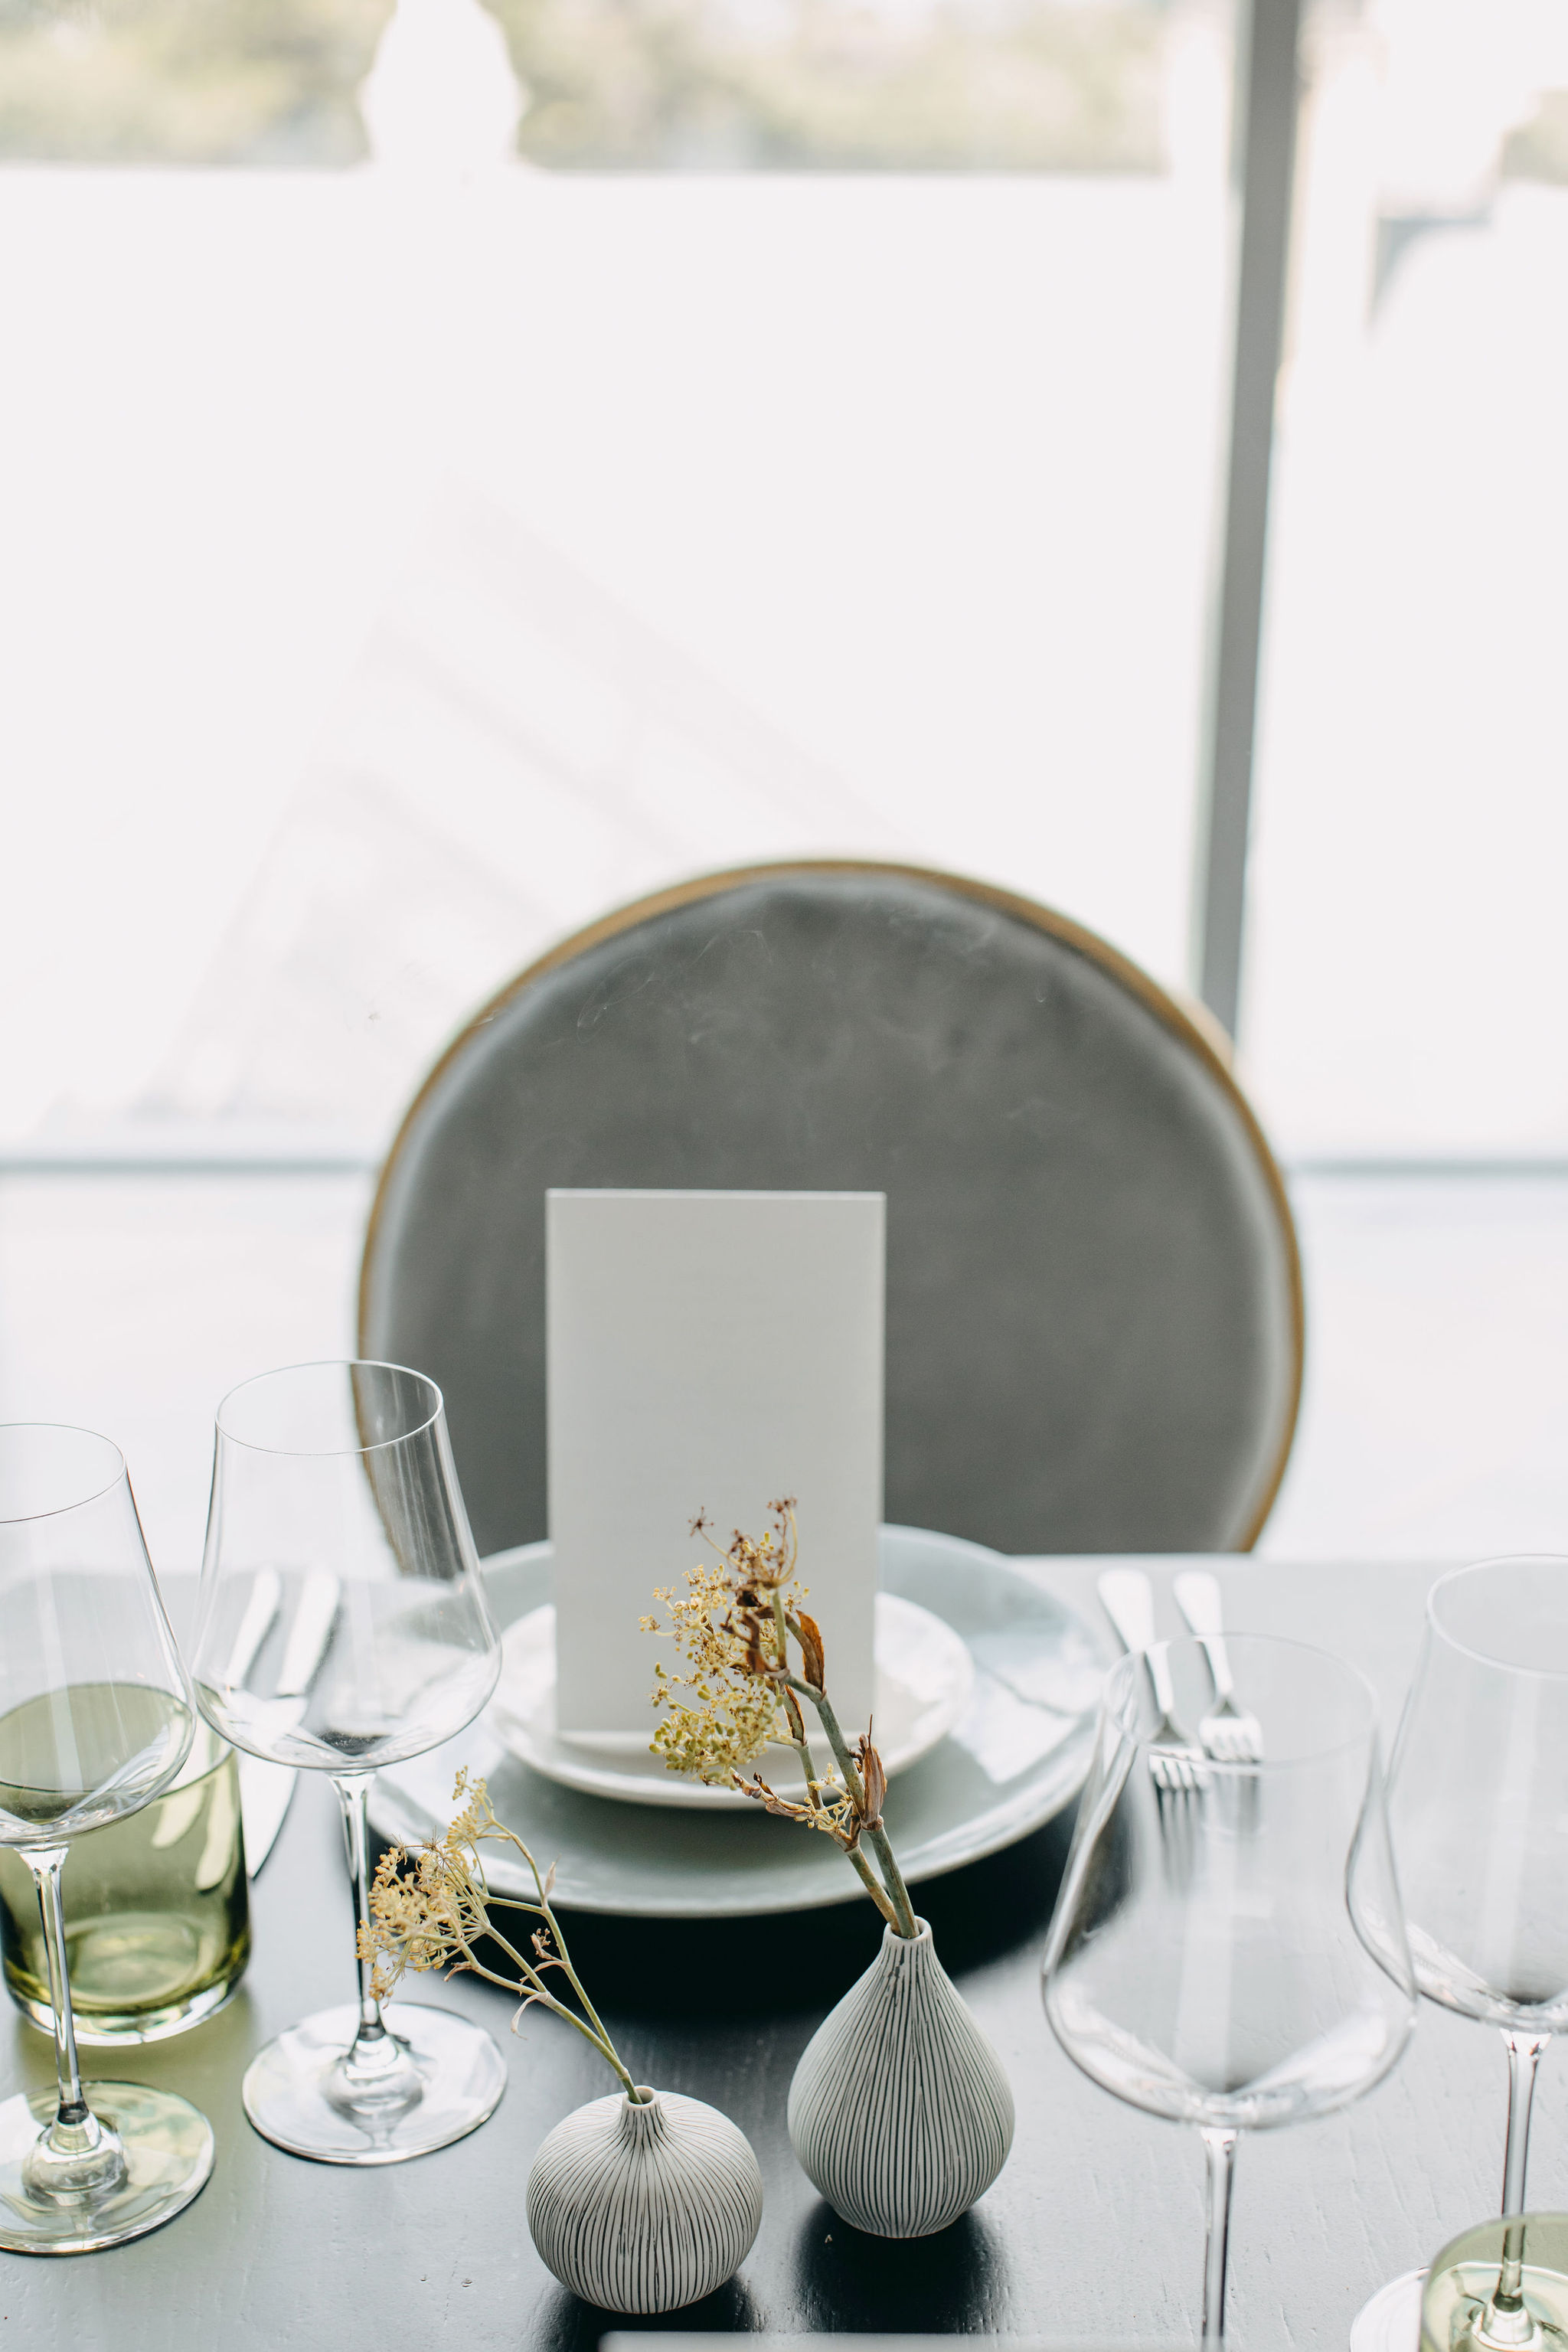 249-STATEBUILDINGS-WEDDINGOPENDAY-16FEB2020